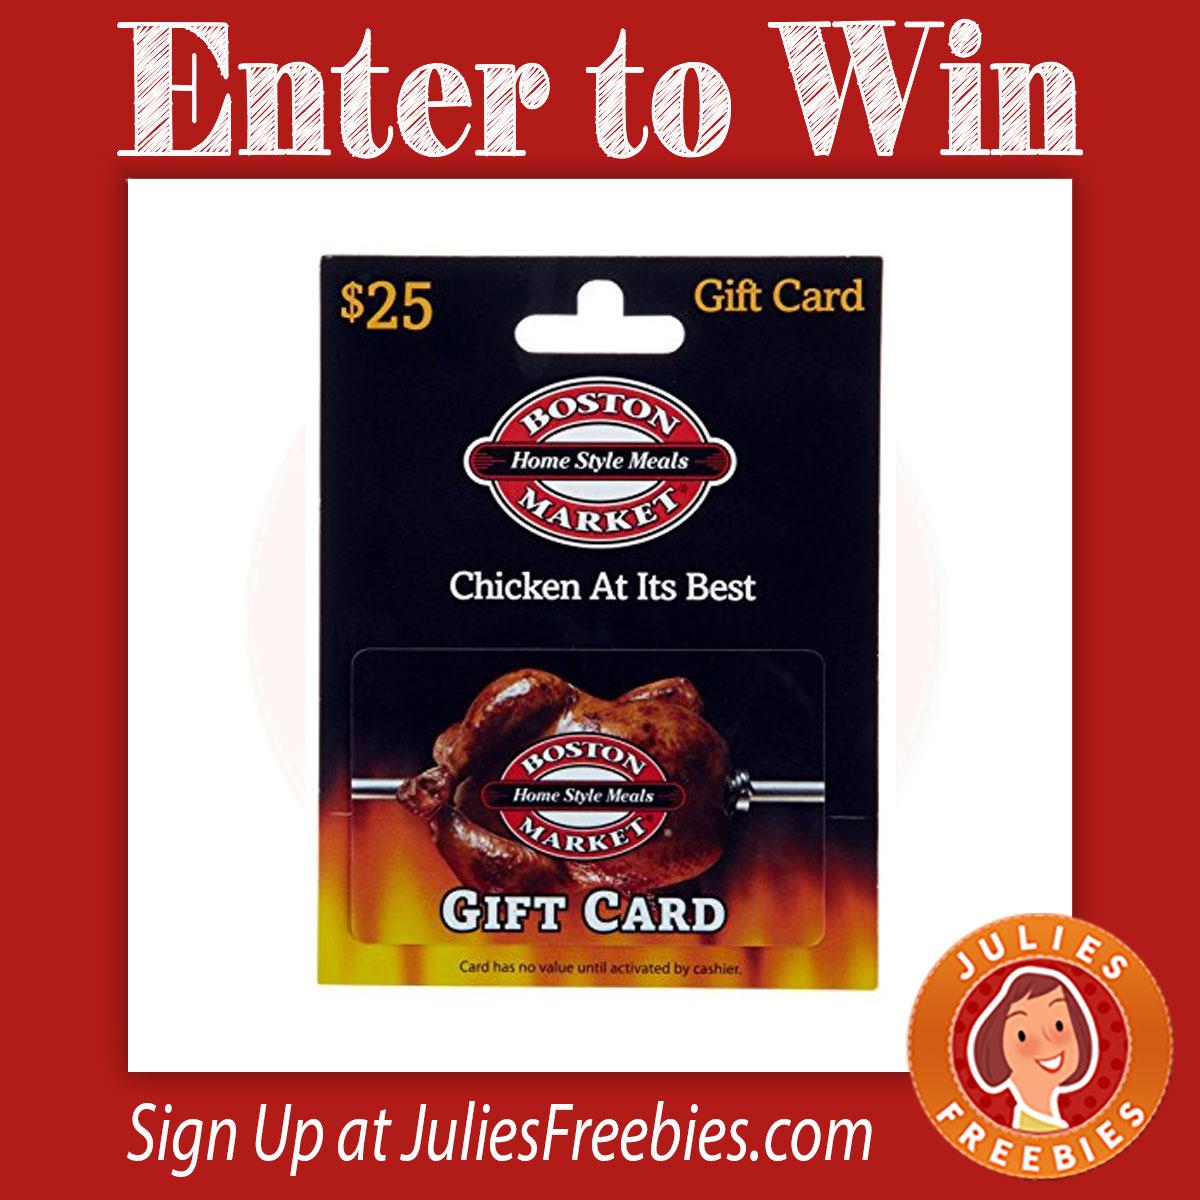 Win A $100 Boston Market Gift Card